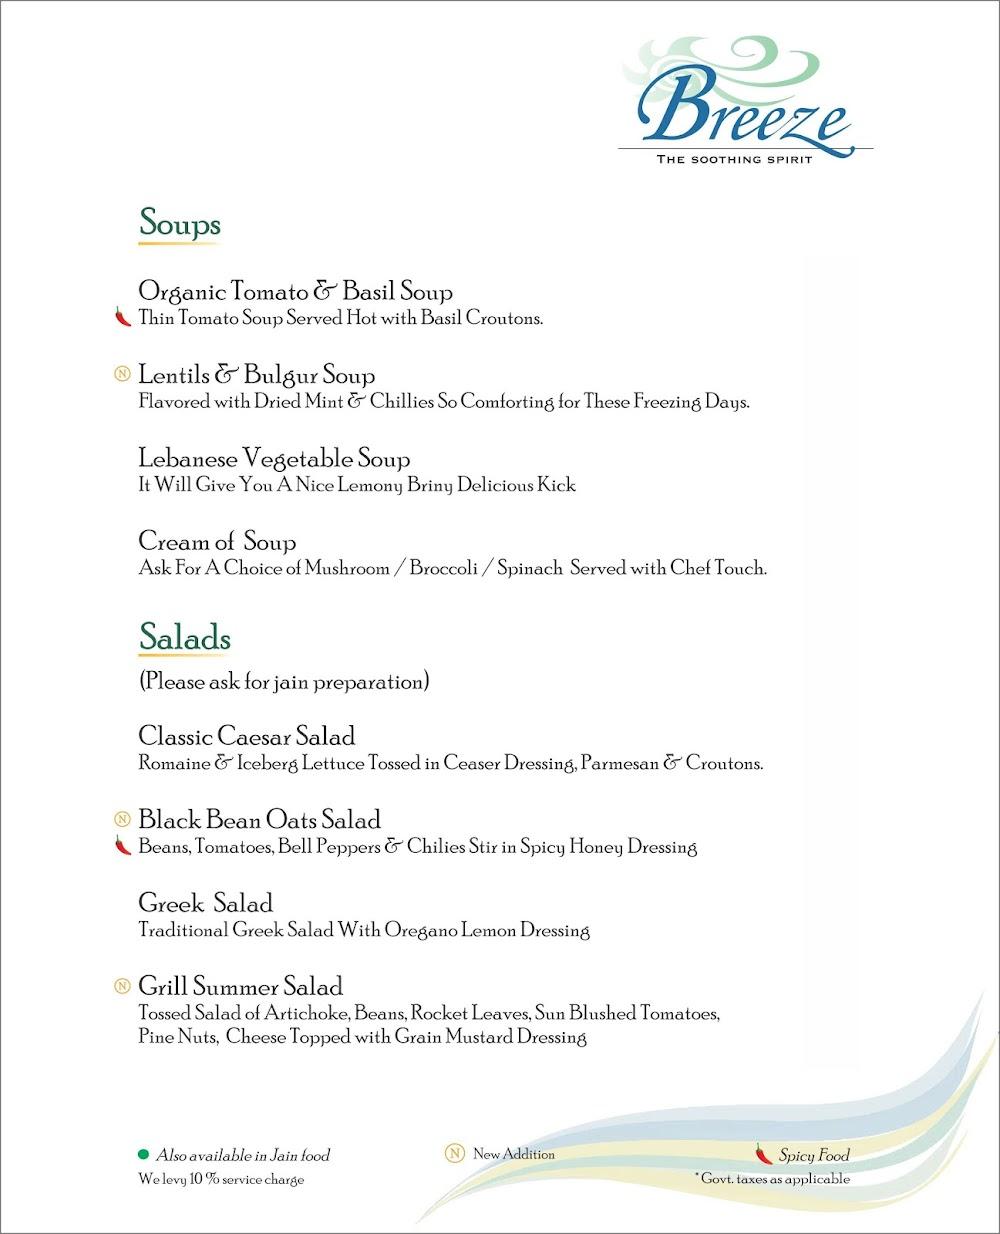 Breeze Lounge menu 11